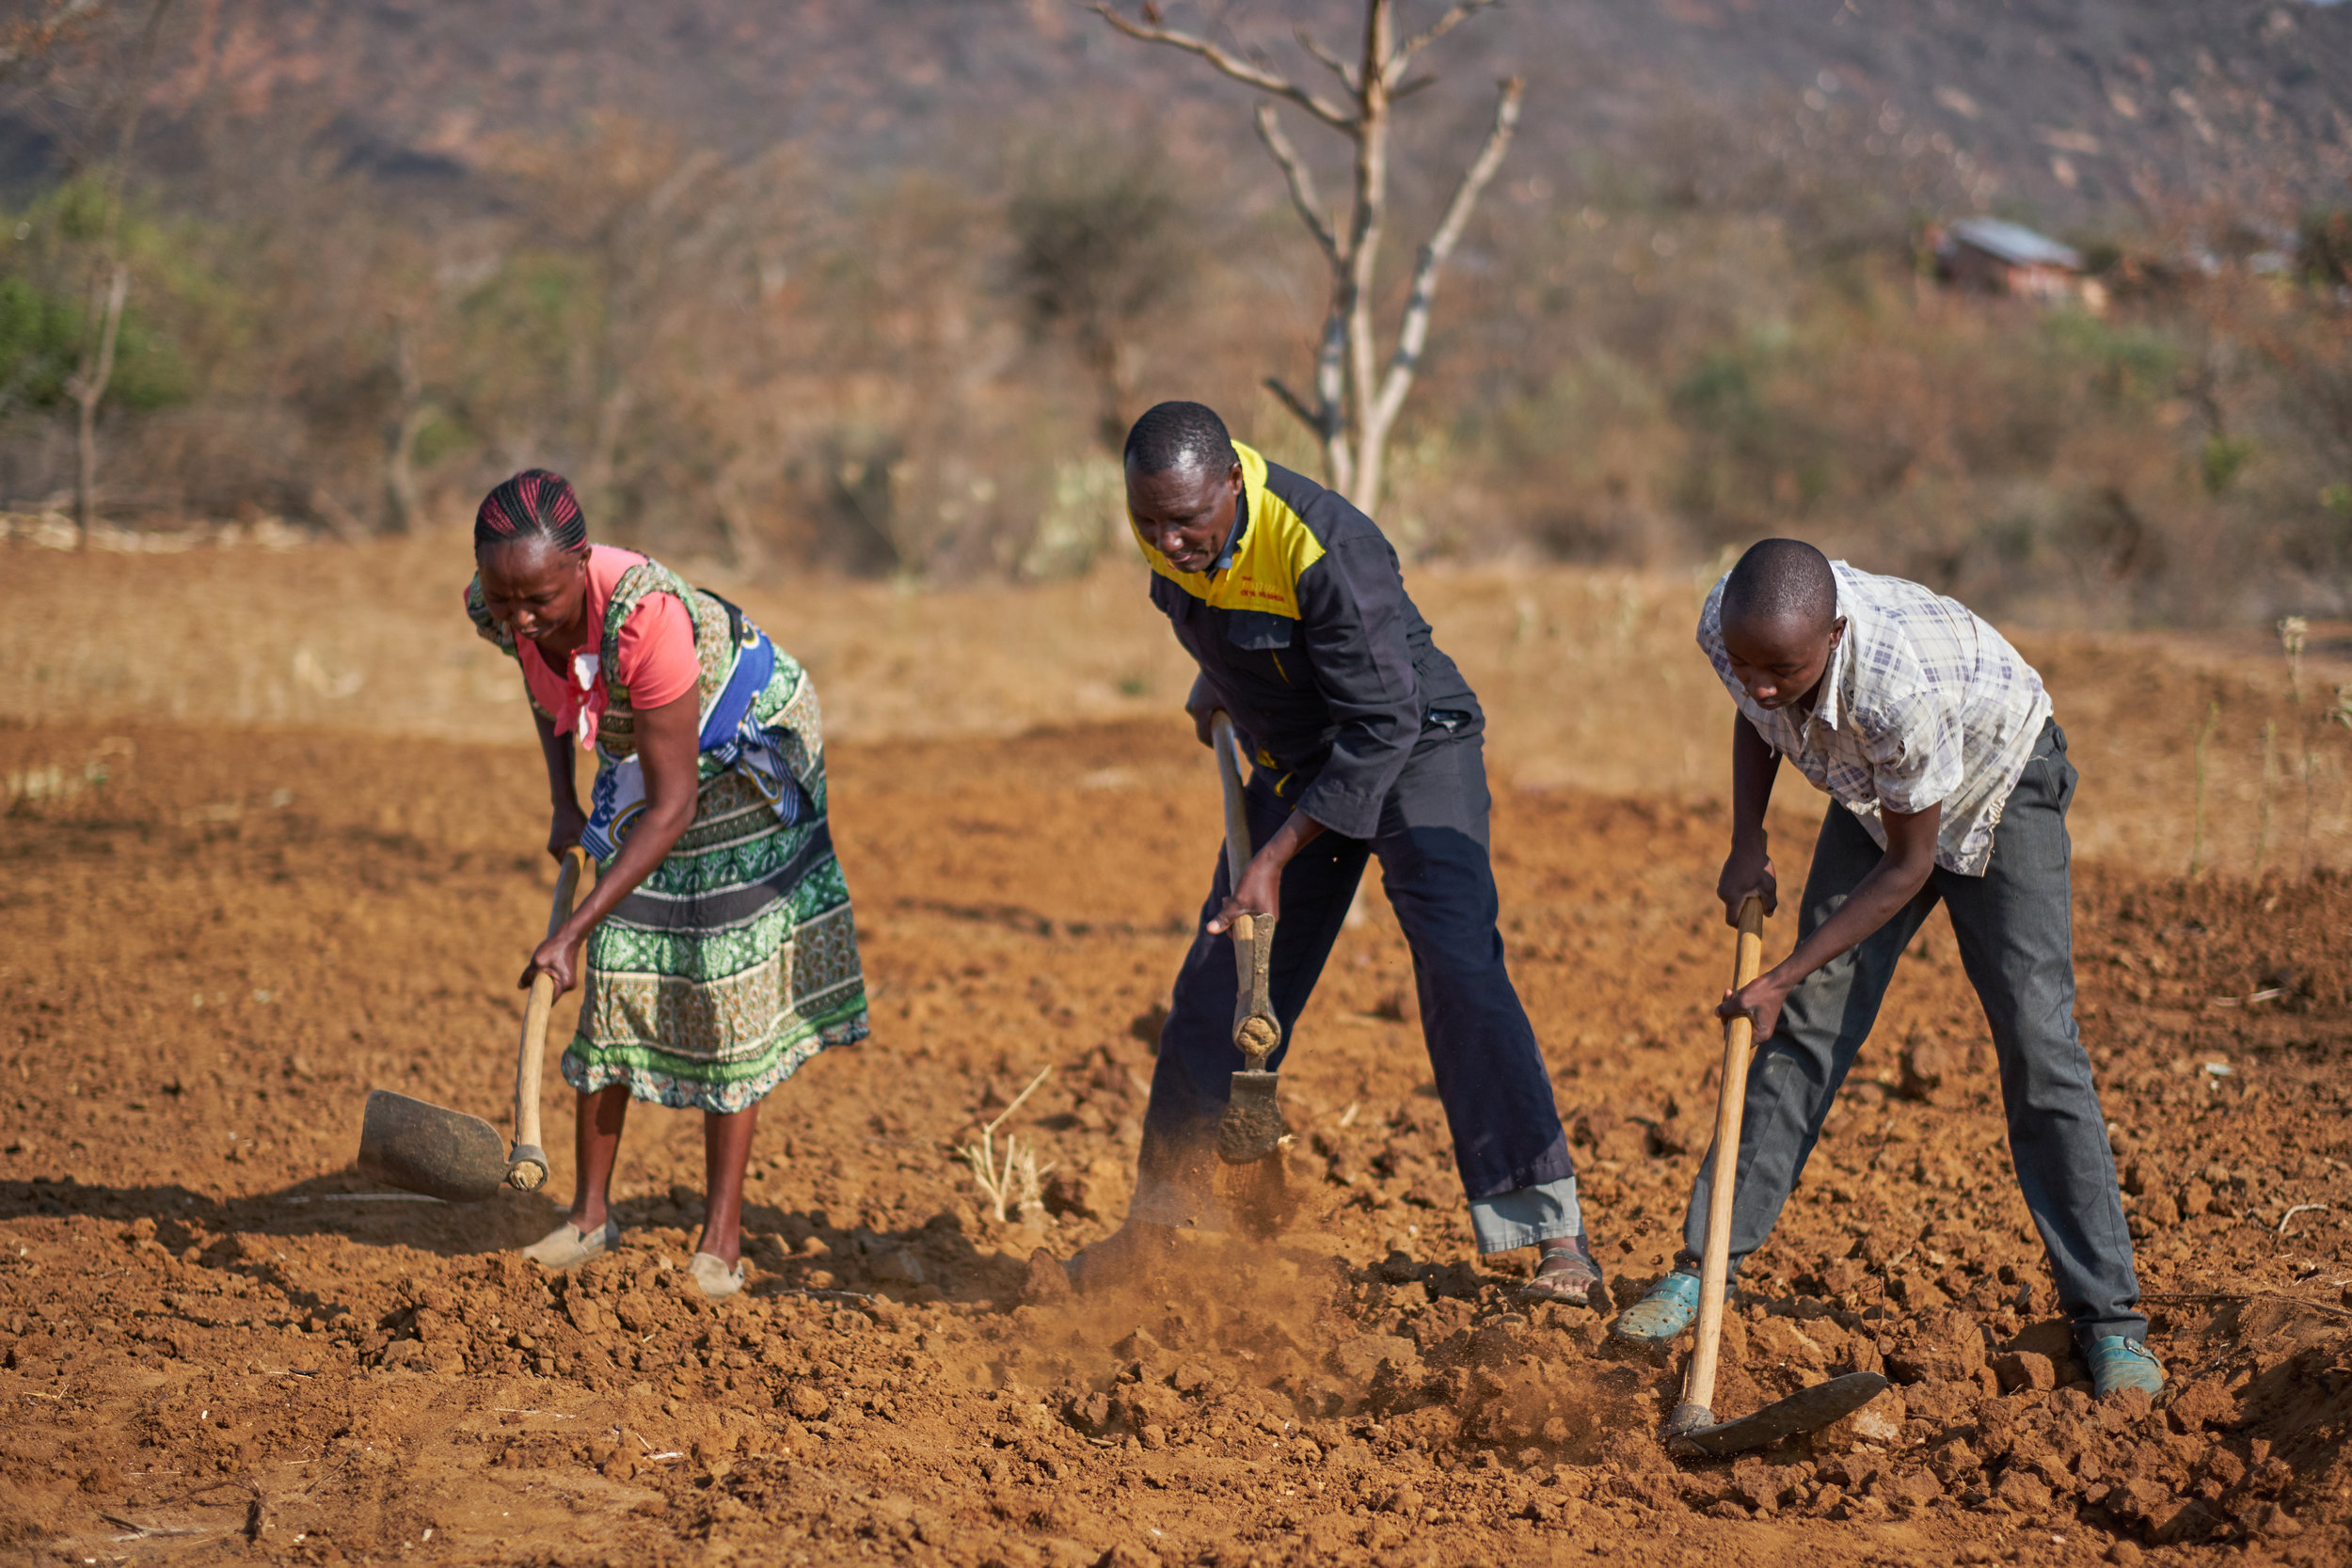 - Smallholder farmers participating in the FIVE project work their land in Kanzui, Eastern Kenya. Credit: Traidcraft Exchange/Khadija Farah